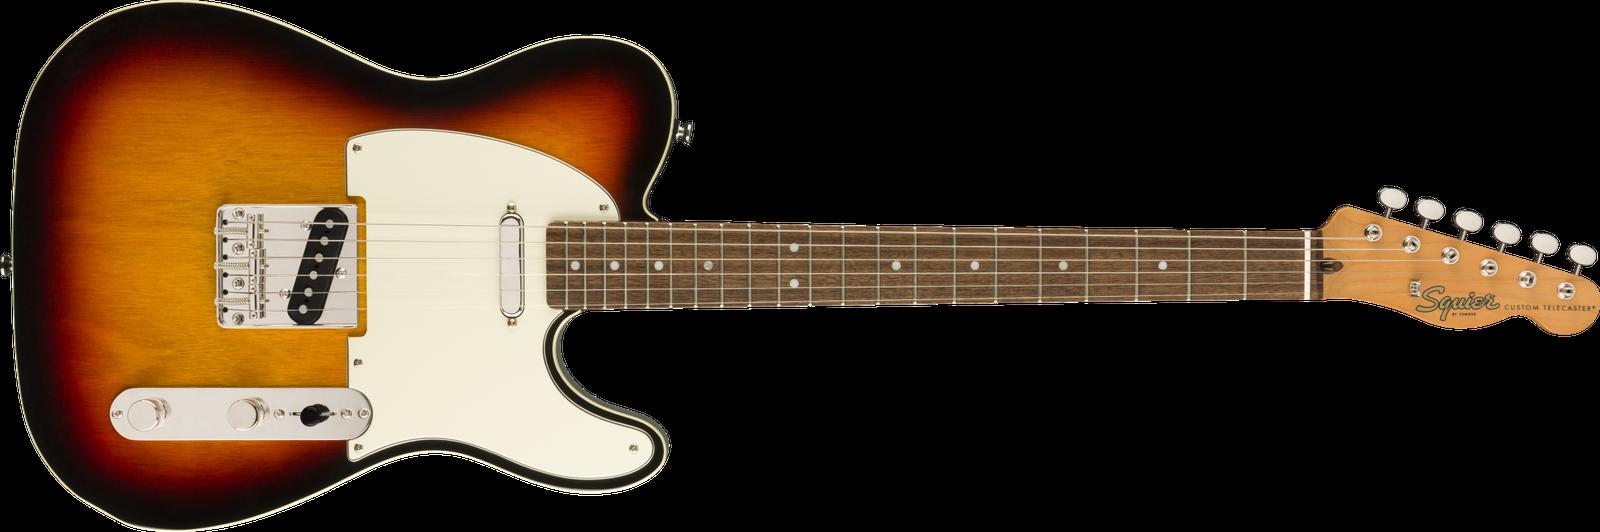 This Squier Telecaster electric guitar is for sale - Squier Classic Vibe '60s Custom Telecaster Electric Guitar - 3-Colour Sunburst